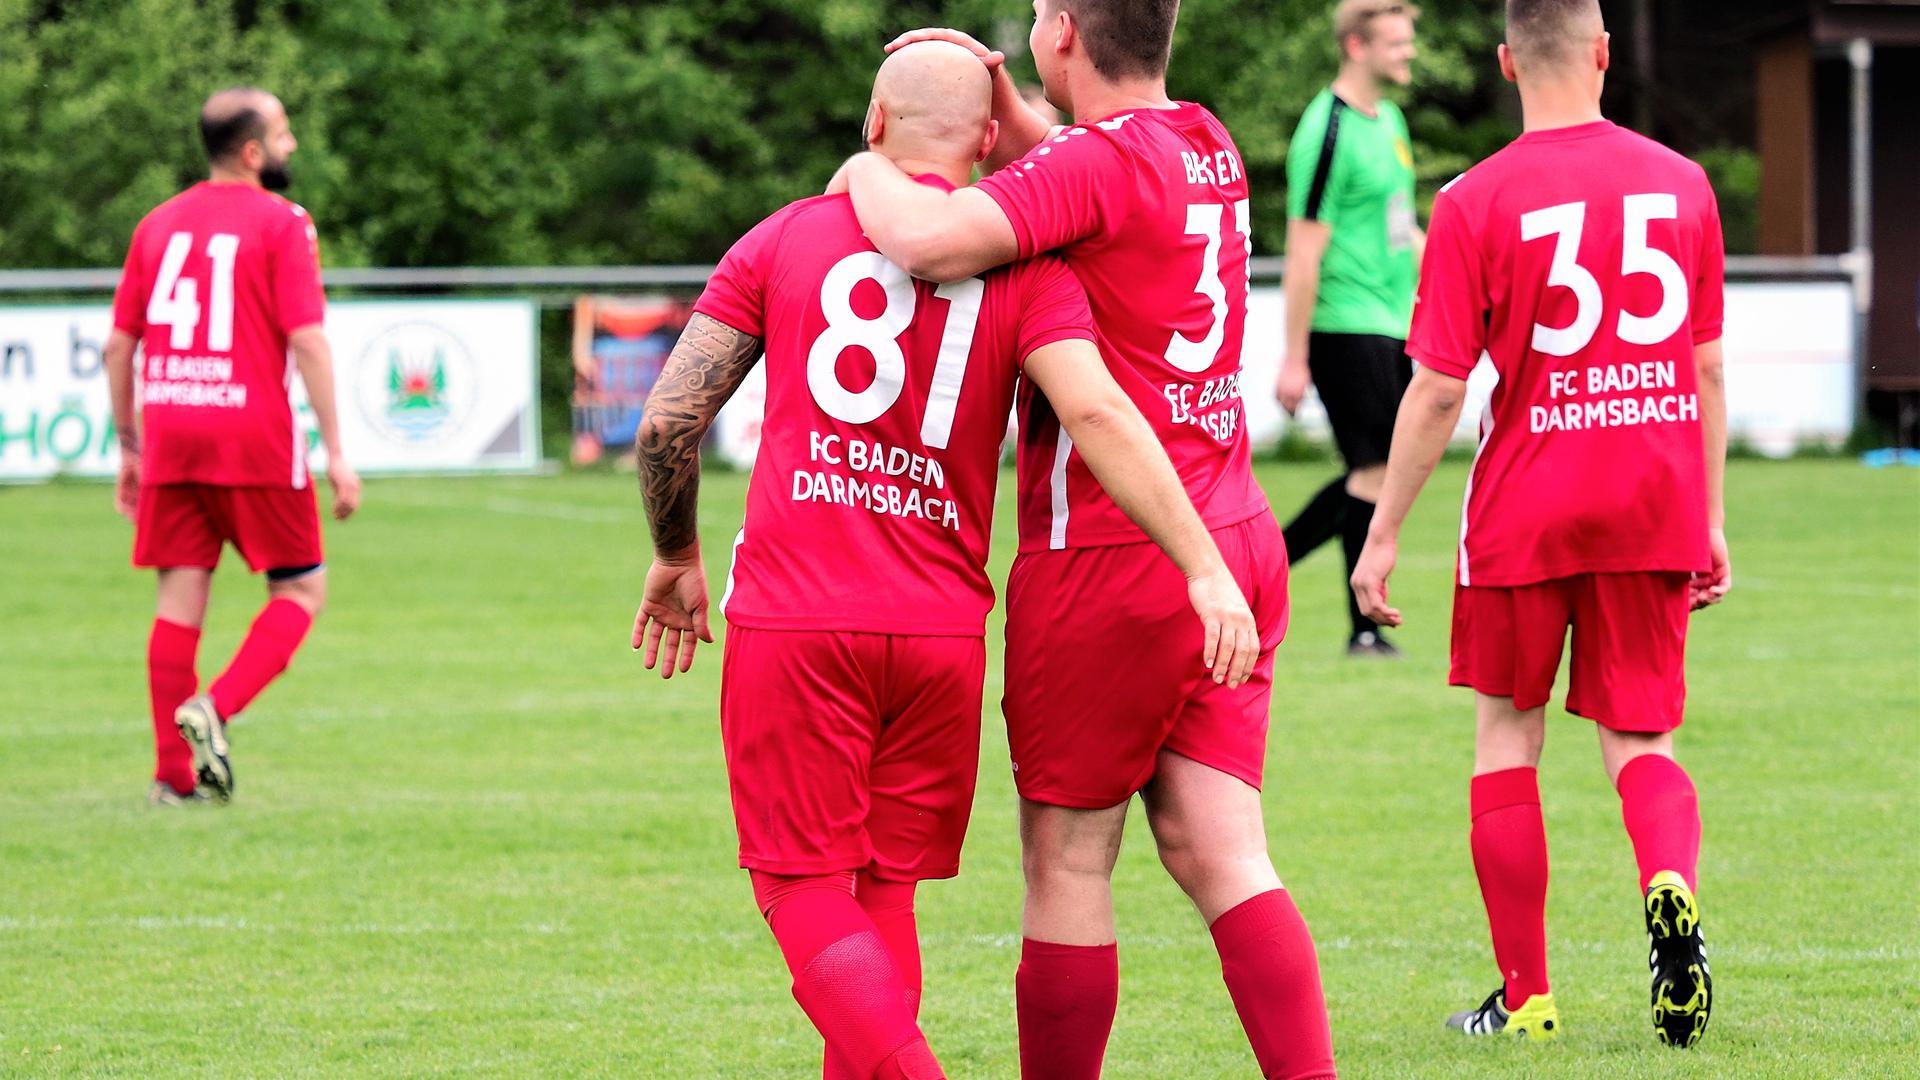 FC Baden Darmsbach